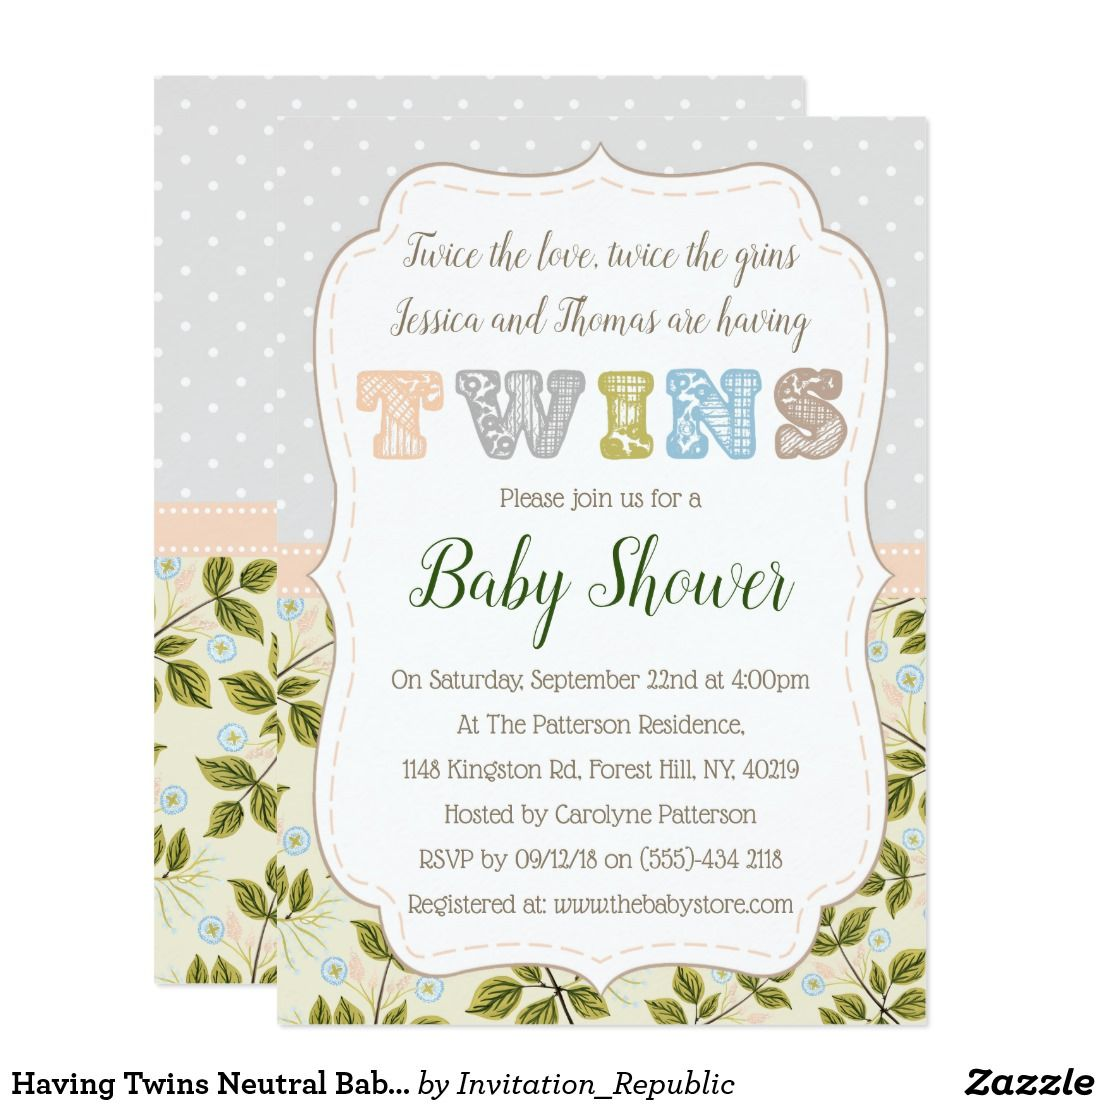 Having Twins Neutral Baby Shower Invitation